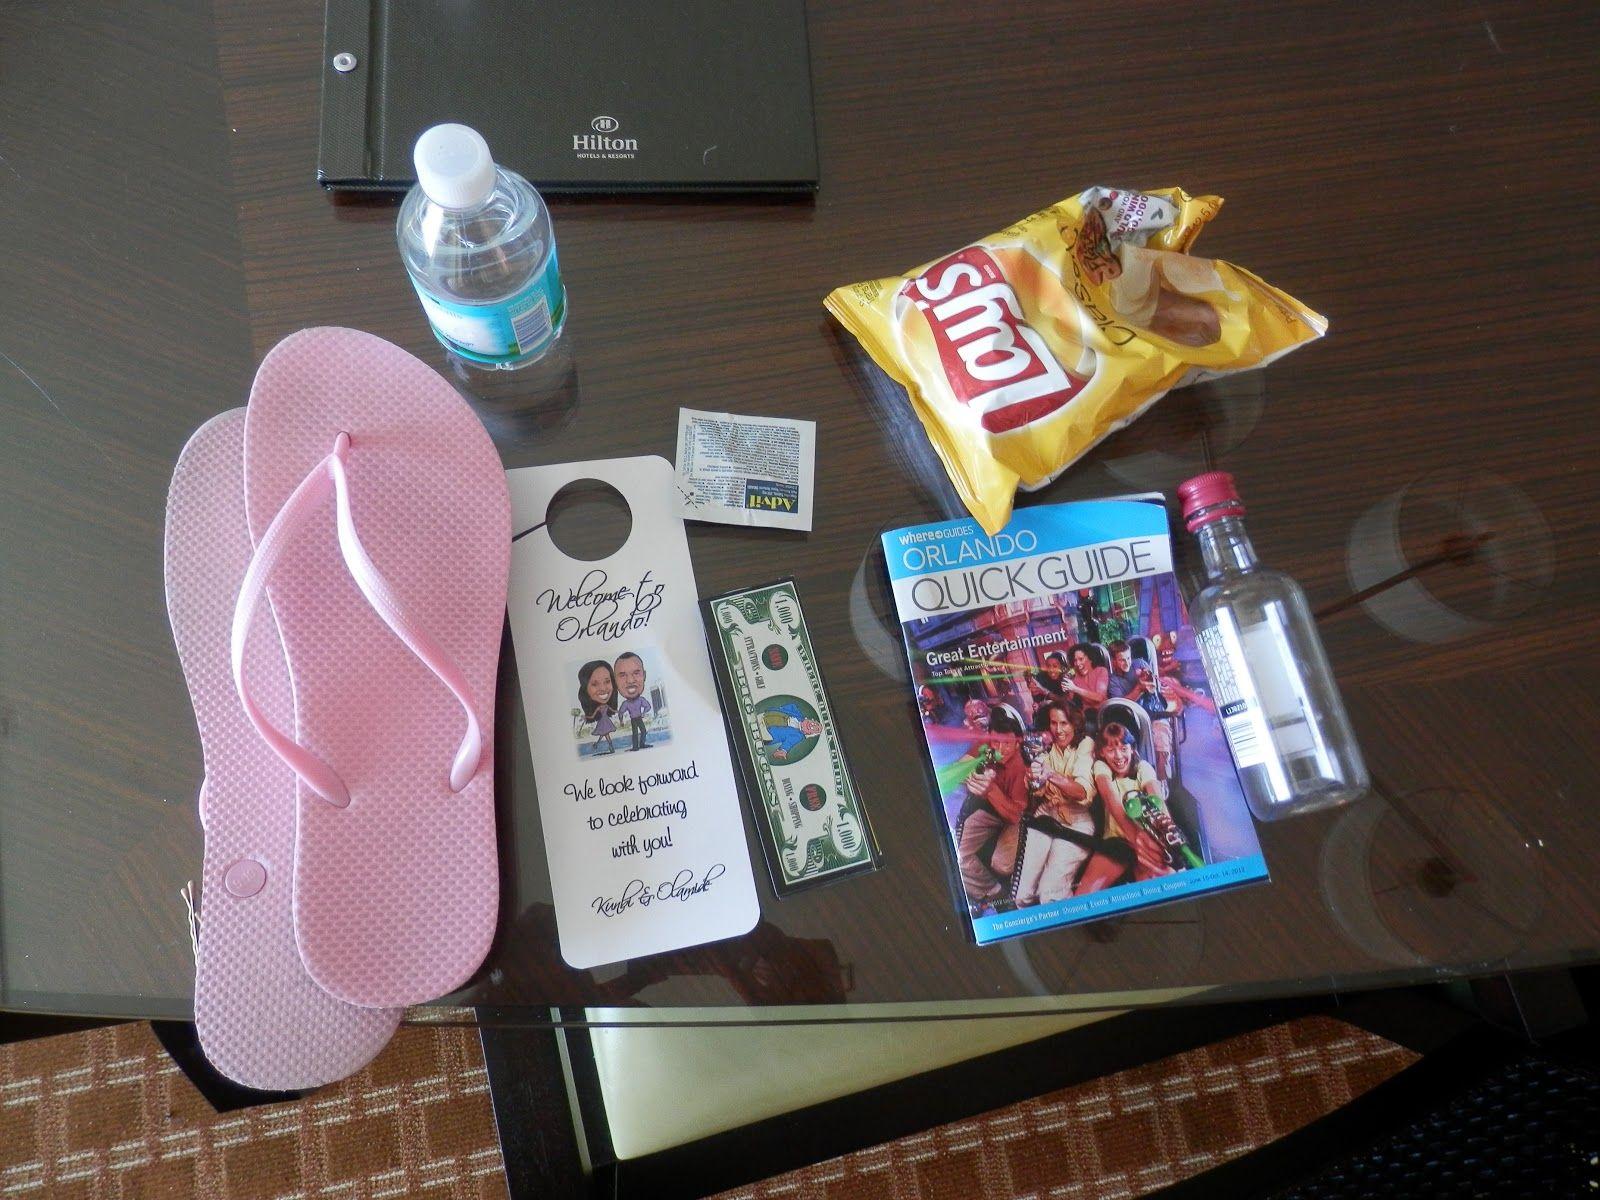 Wedding Welcome Bag Ideas Pinterest : Ideas. Out Of Town Wedding Gift Bags. skinnycargopantsaddict wedding ...